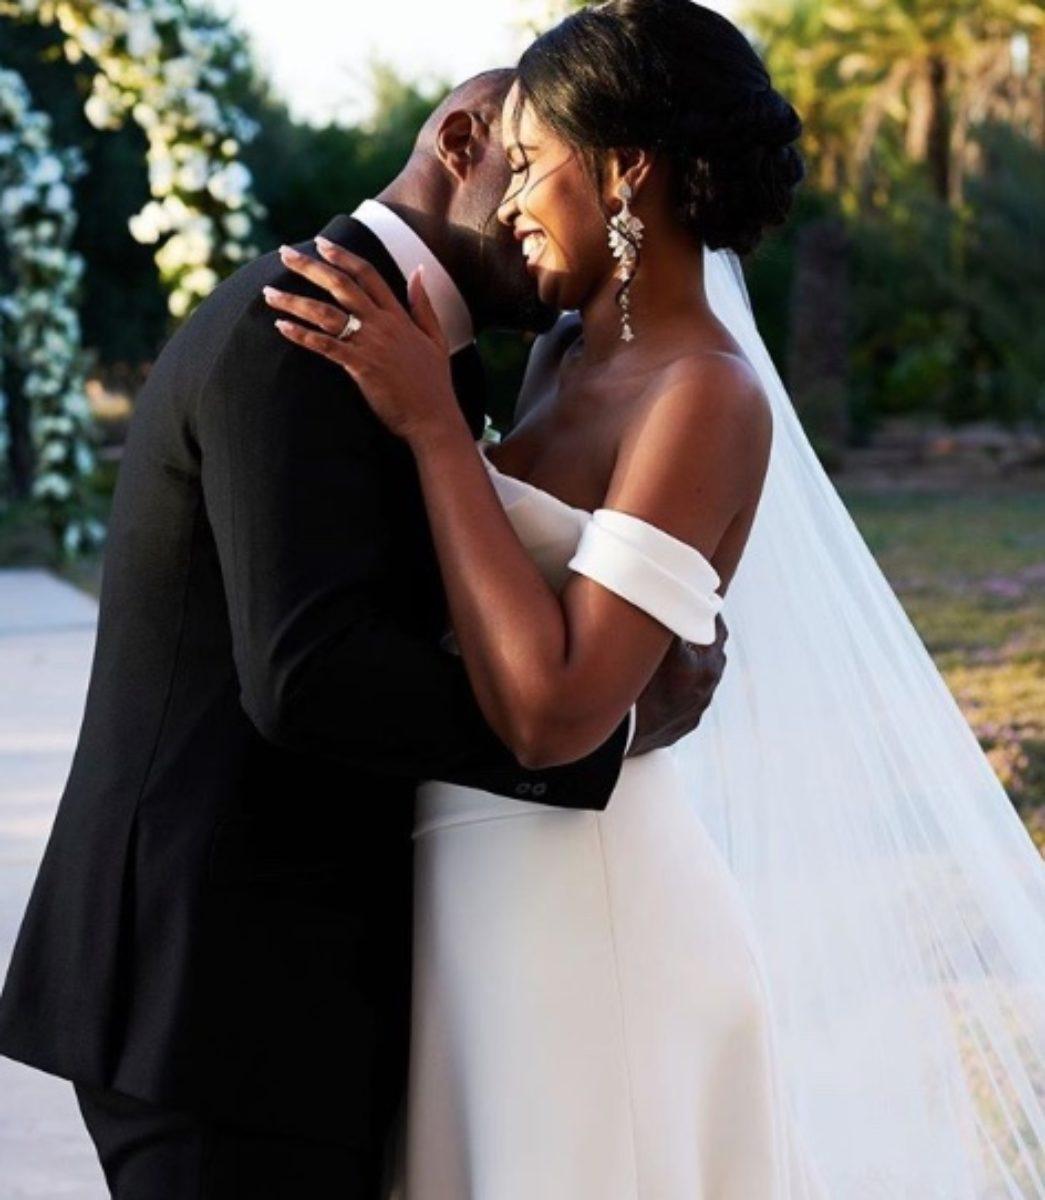 Married is idris elba Idris Elba